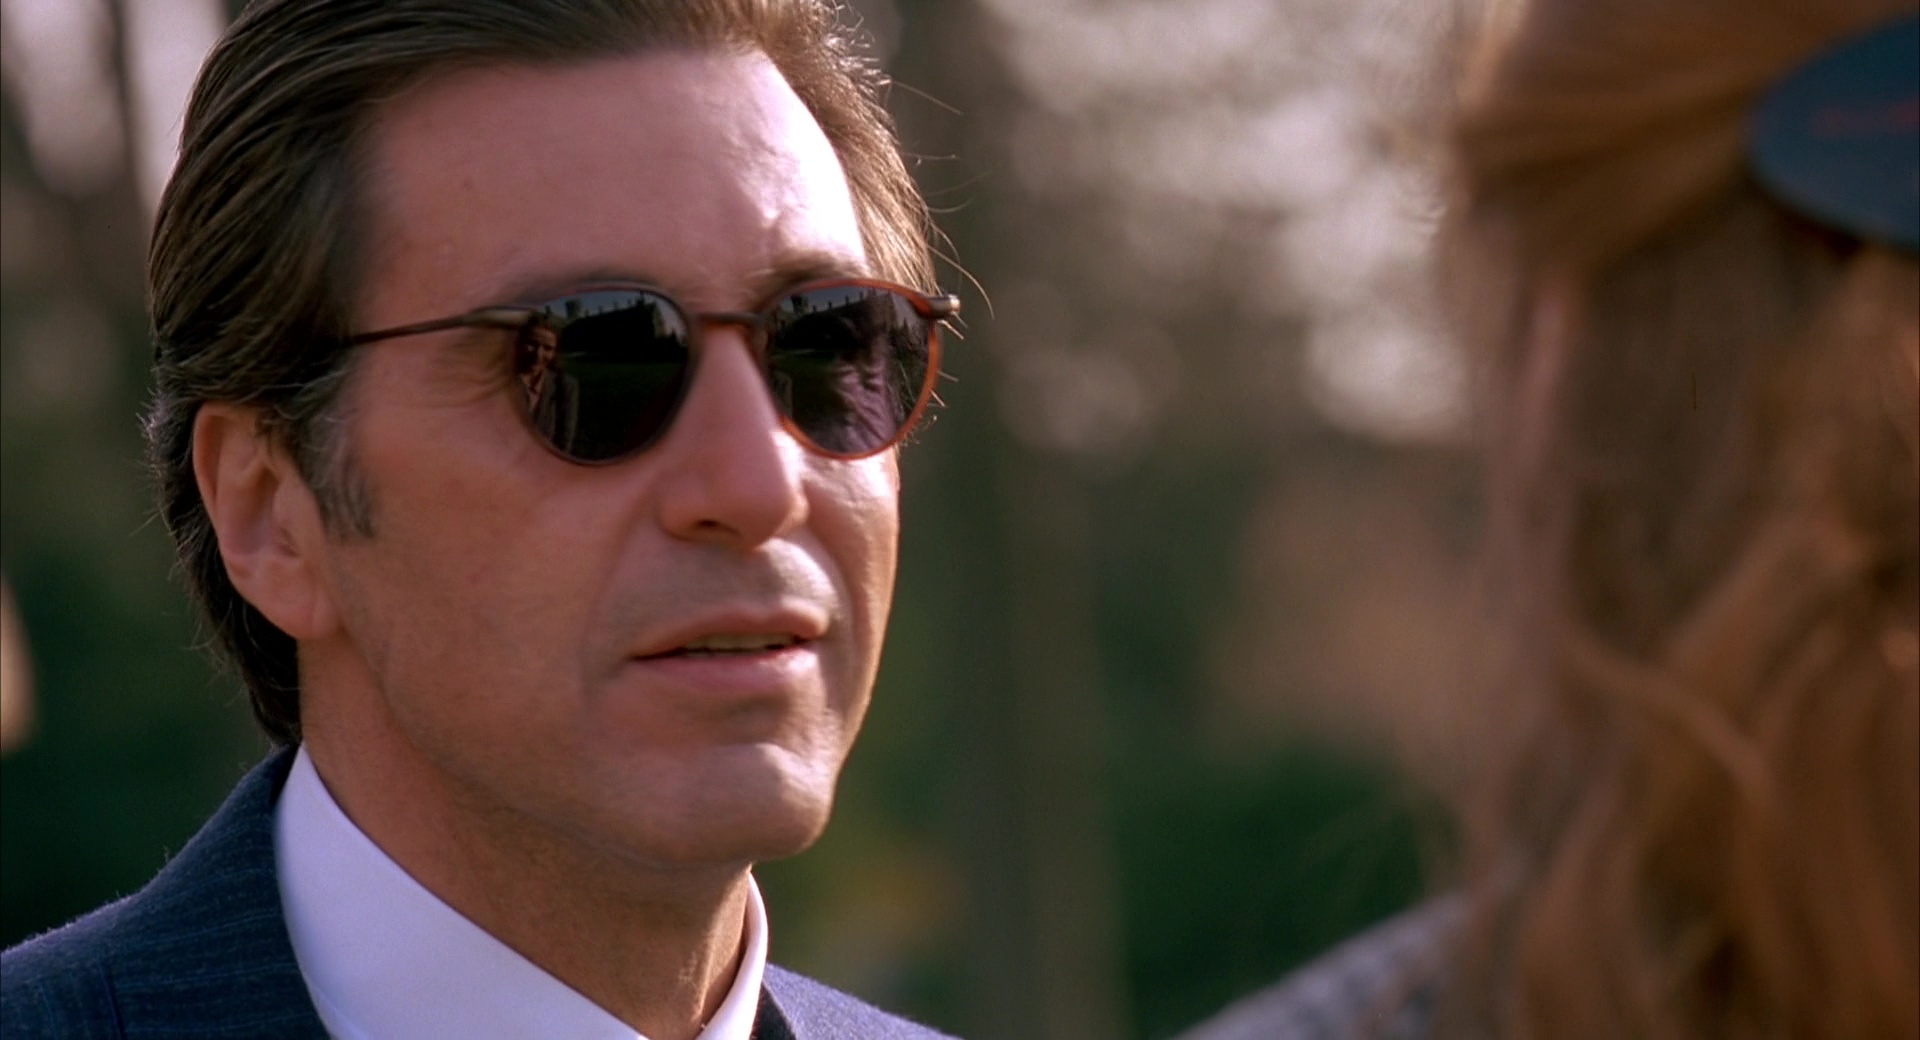 matsuda sunglasses worn by al pacino in scent of a woman